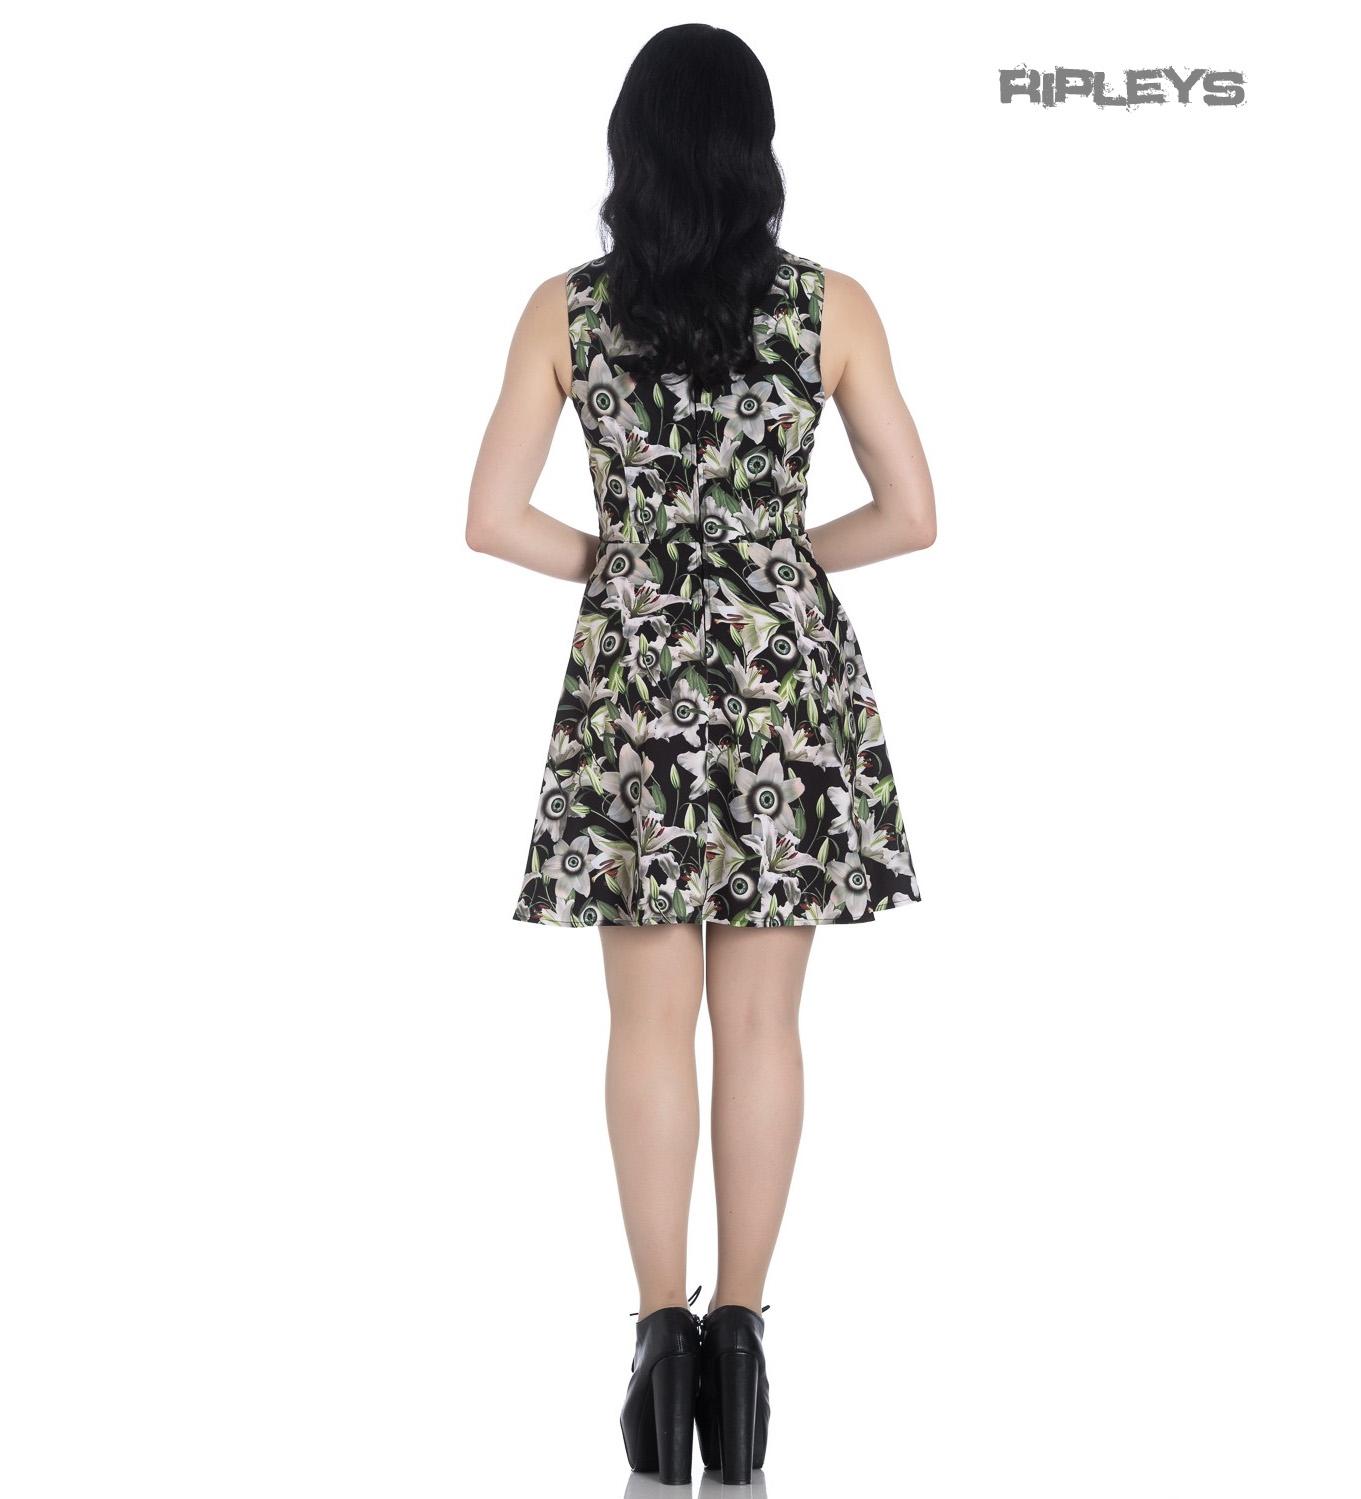 Hell-Bunny-Black-Lace-Up-Goth-Punk-Mini-Dress-PEEPERS-Eyeballs-Flowers-All-Sizes thumbnail 42